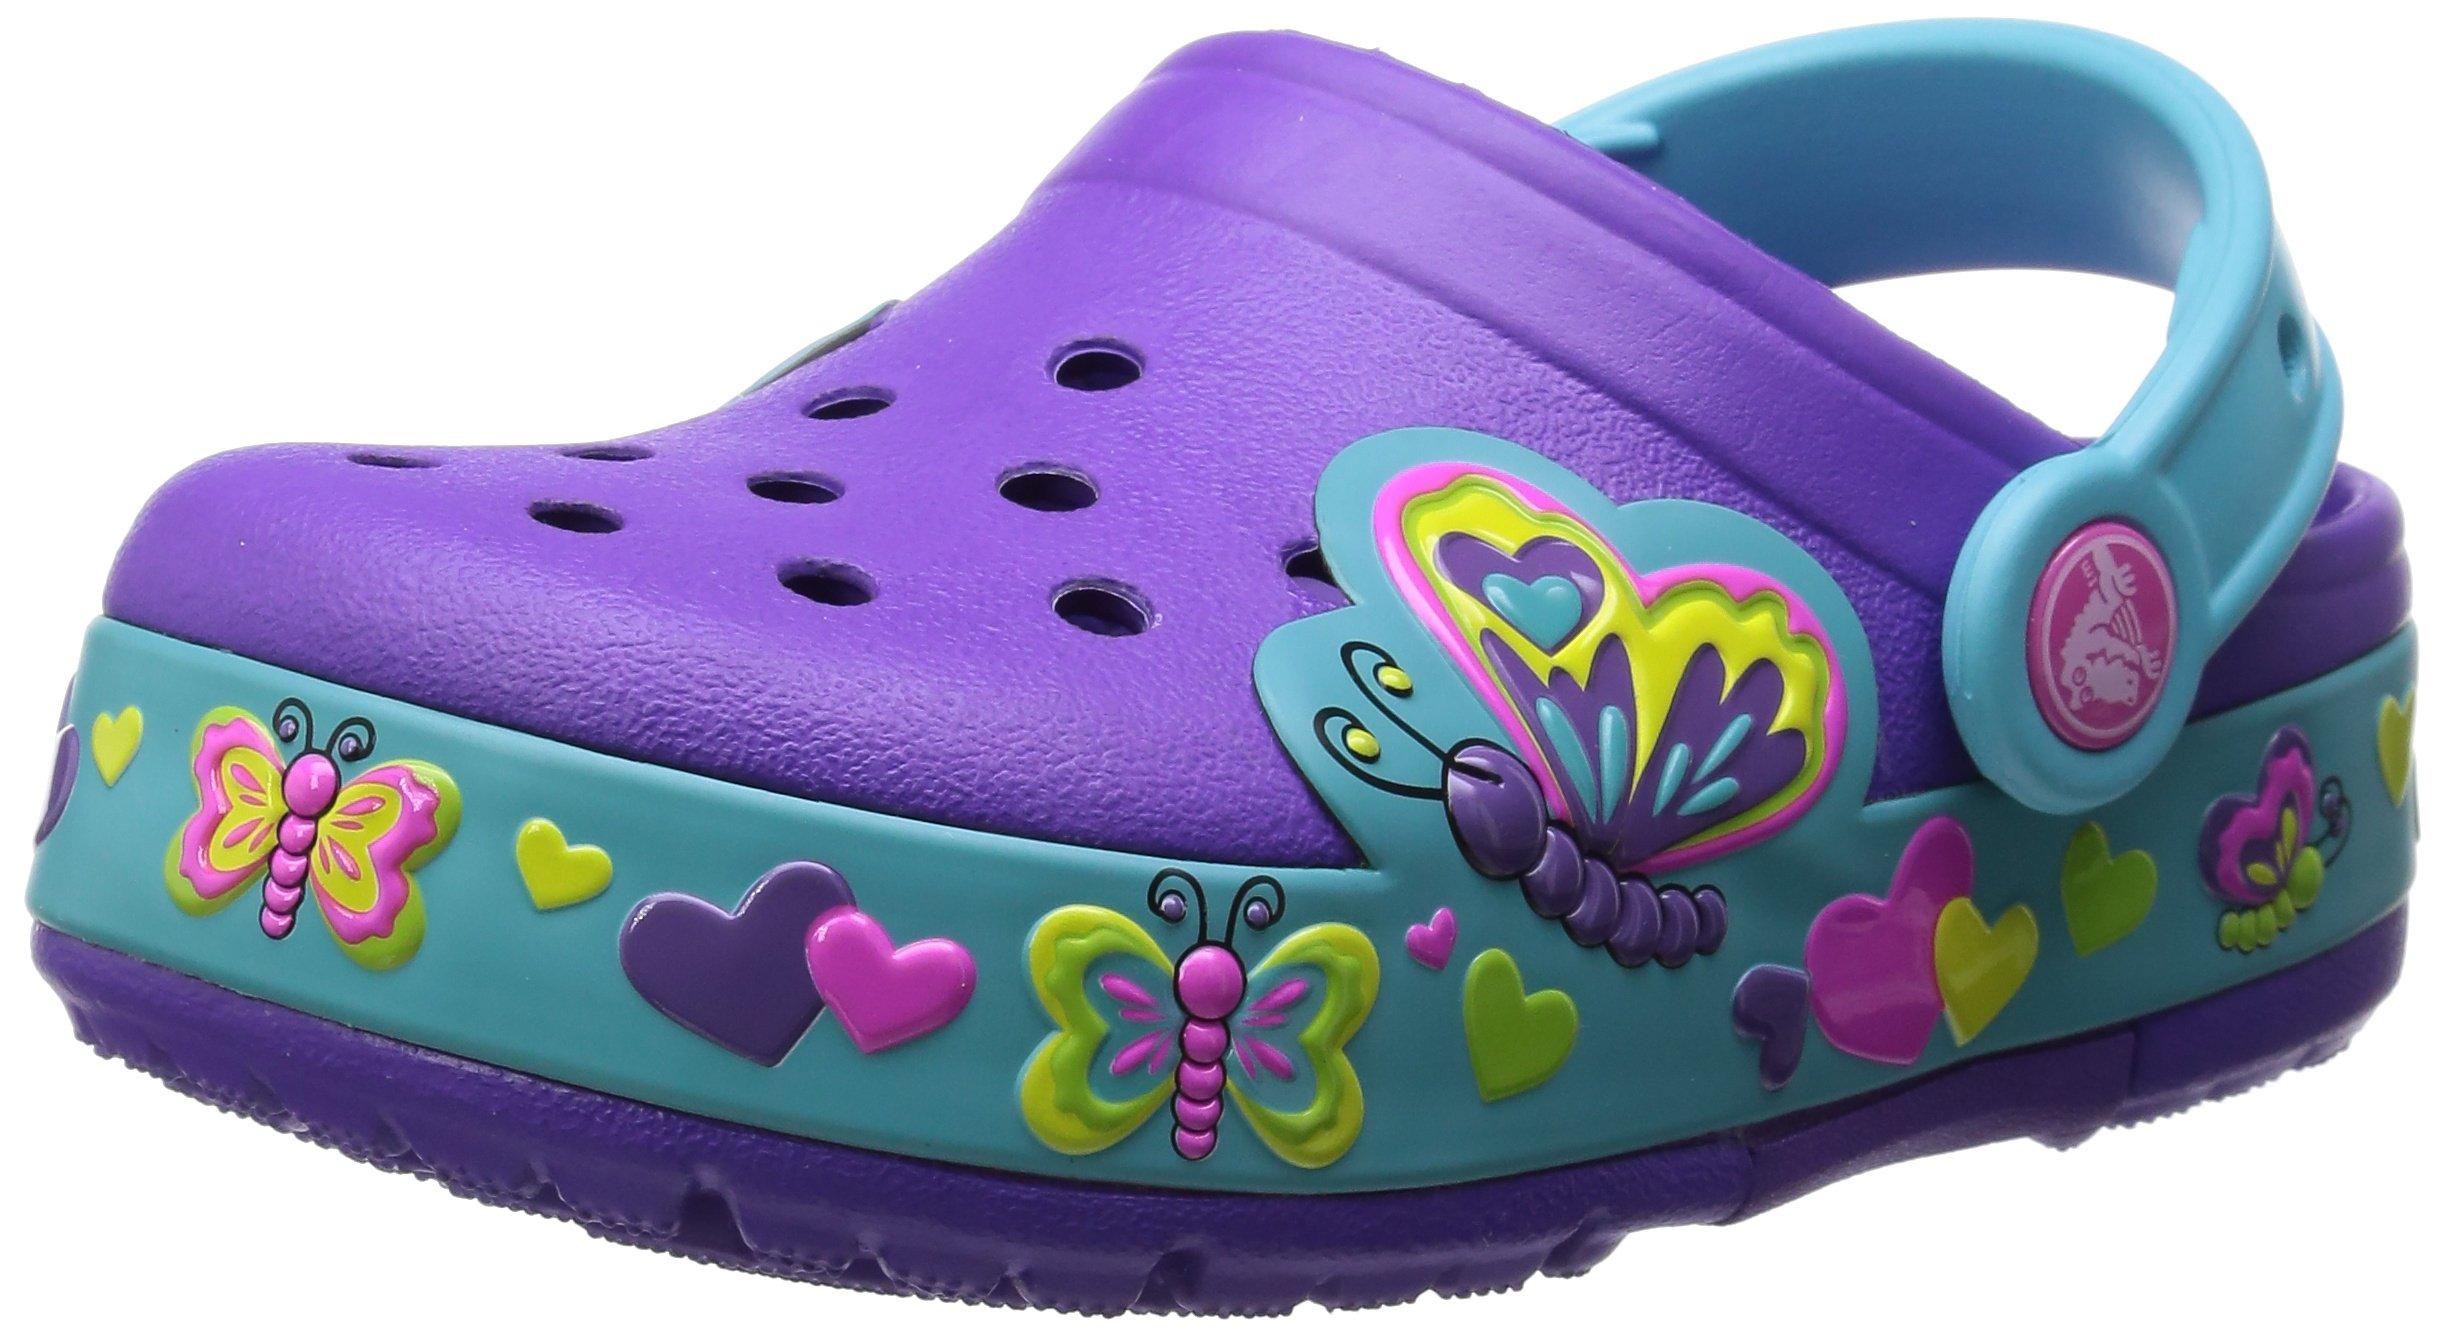 Crocs Kids Butterfly Light-up Clog (Toddler/Little Kid),Neon Purple/Aqua,10 M US Toddler